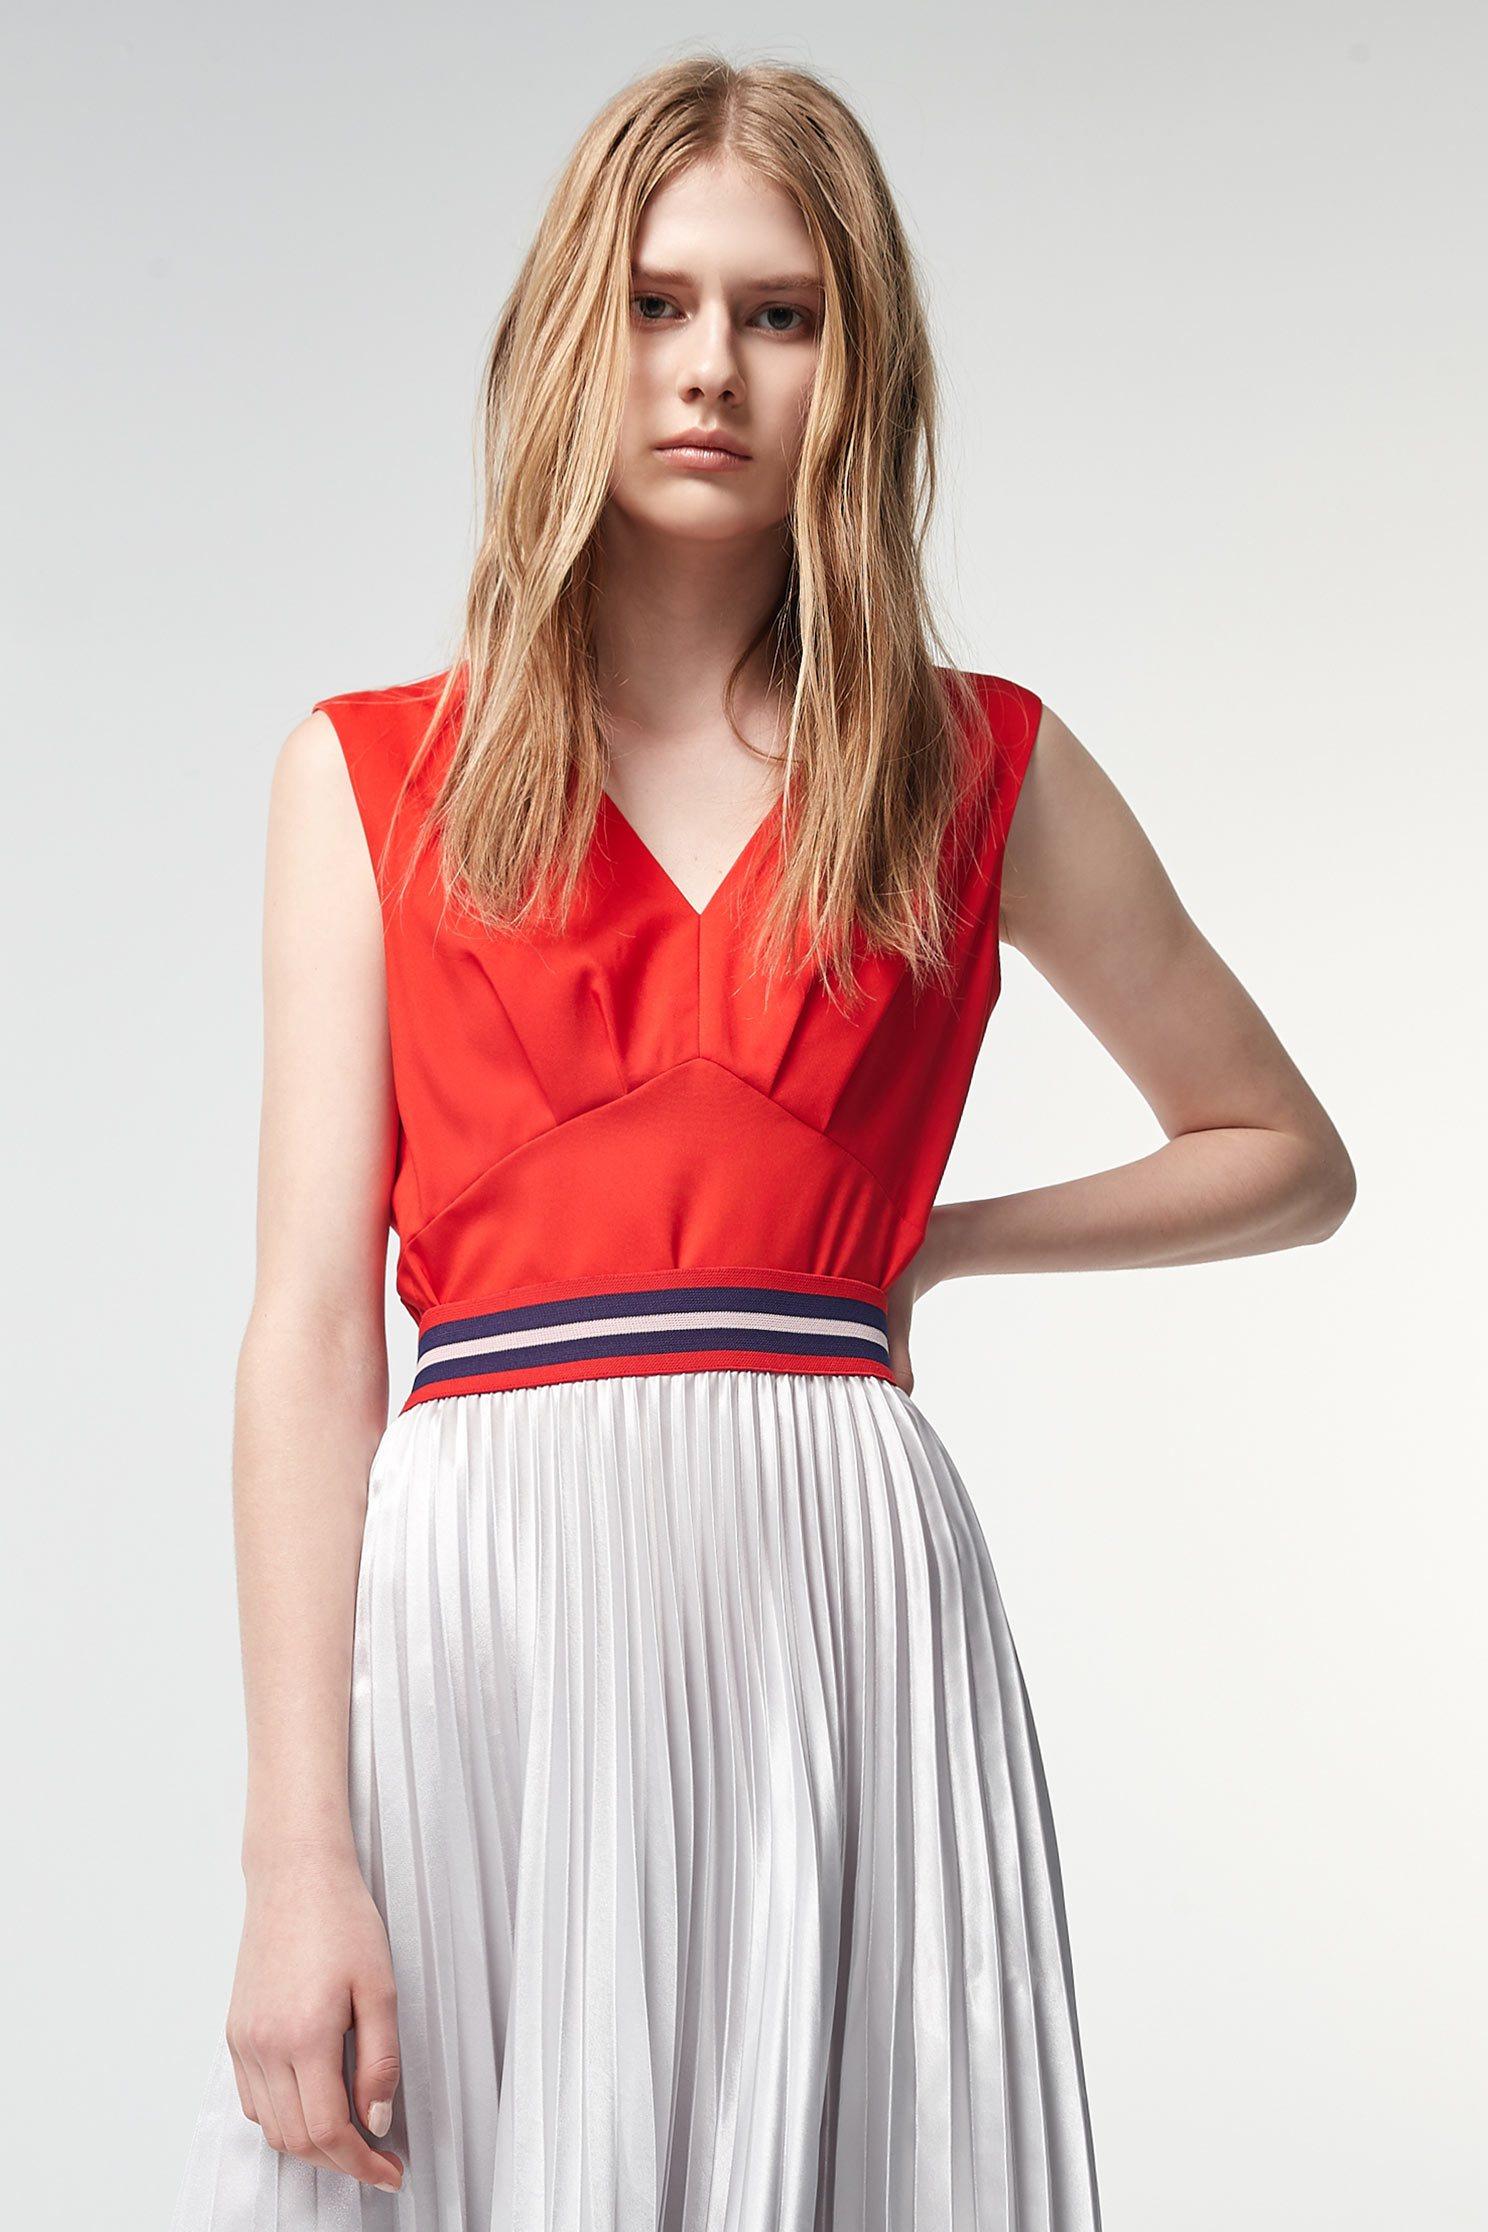 Red sleeveless vest,v-necktop,singlet,top,watersigns,sleevelesstop,vest,vest